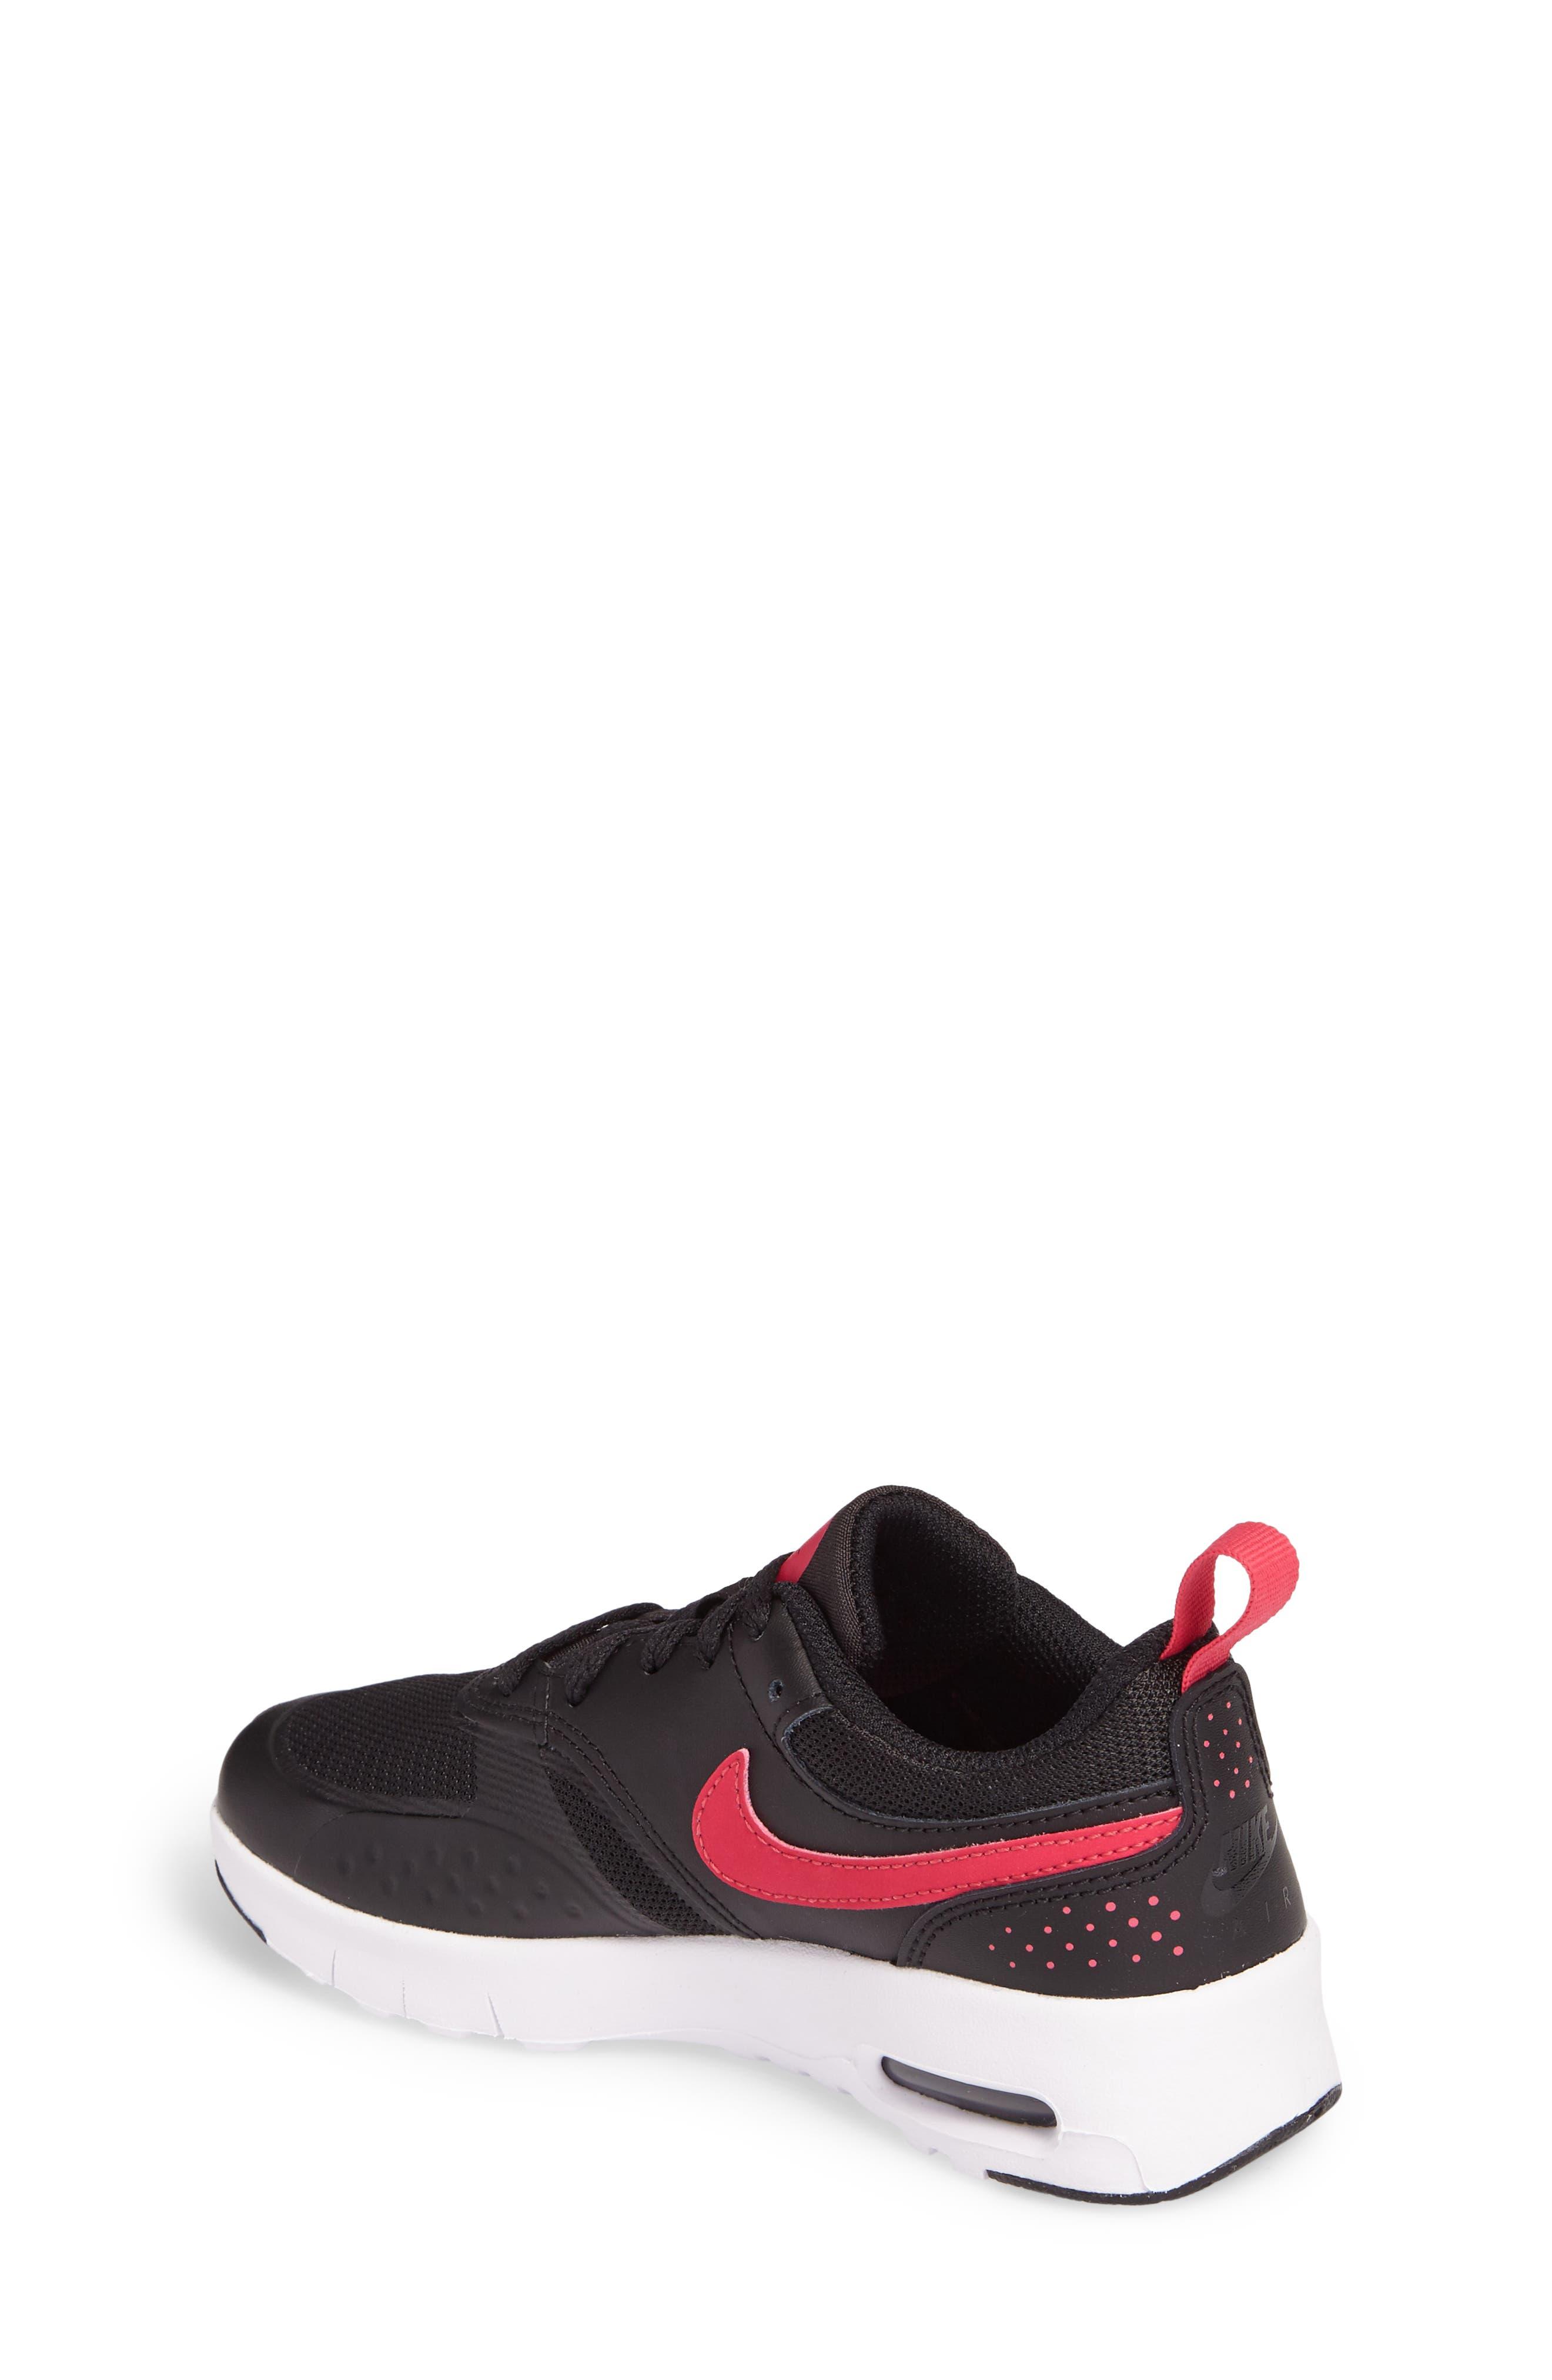 Air Max Vision Sneaker,                             Alternate thumbnail 2, color,                             Black/ Pink